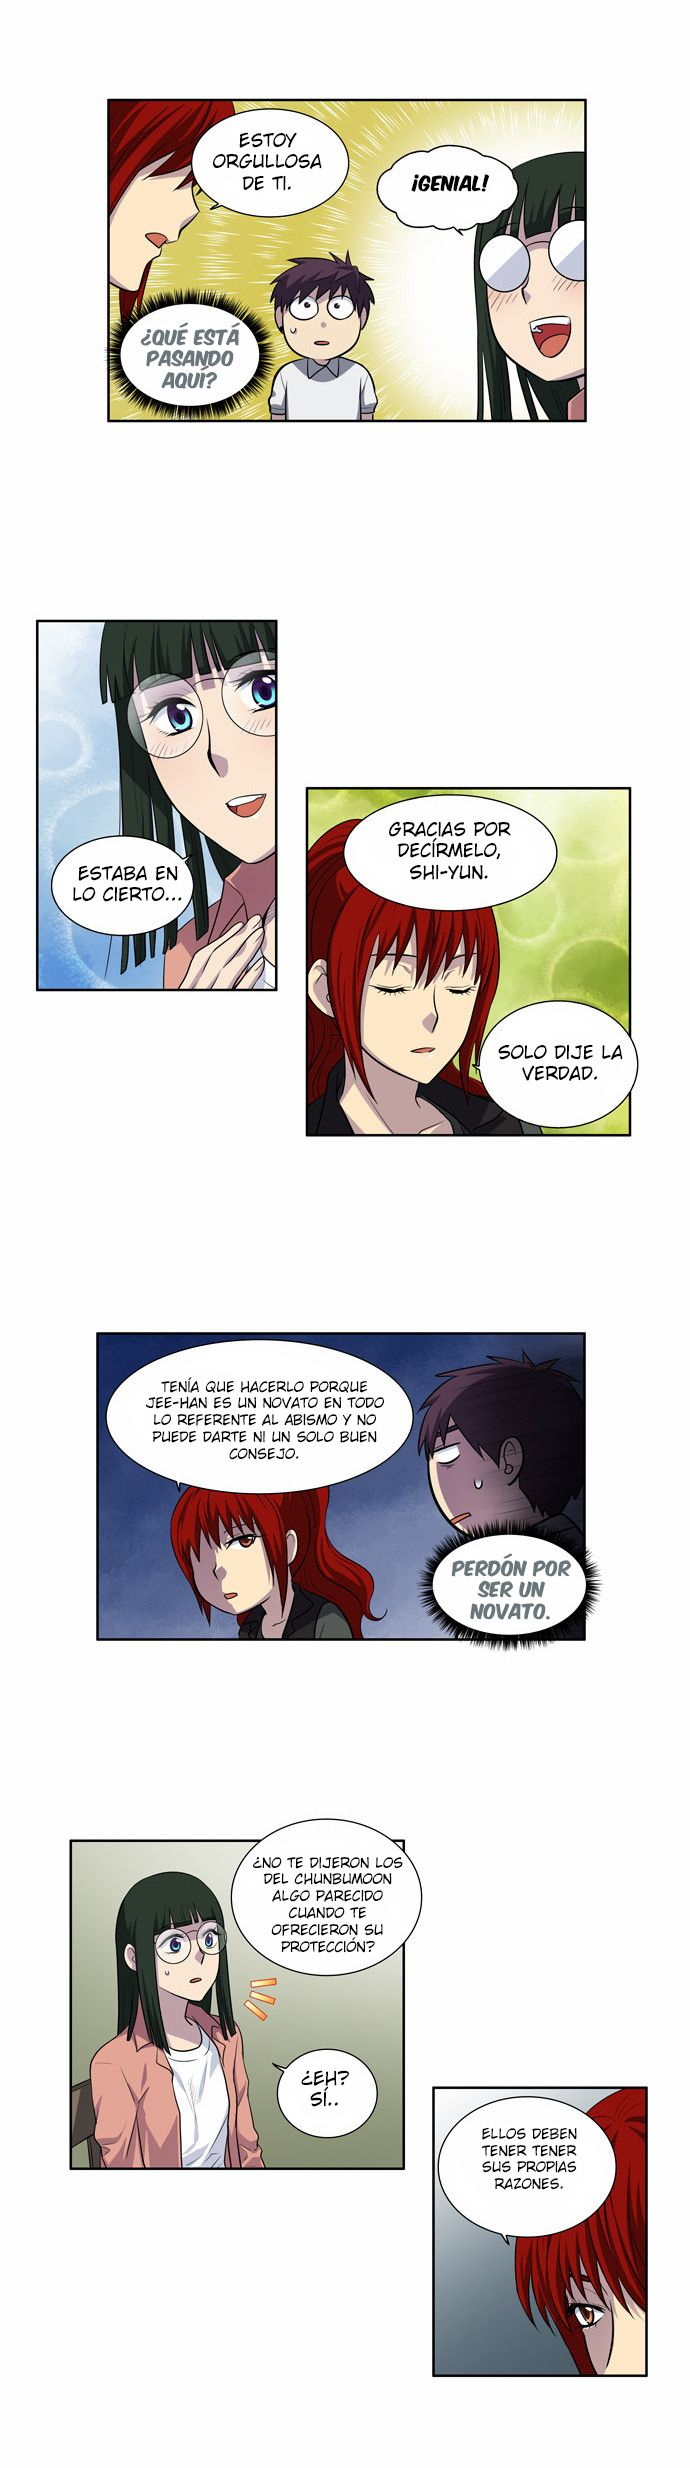 http://c5.ninemanga.com/es_manga/61/1725/476787/540ae6b0f6ac6e155062f3dd4f0b2b01.jpg Page 7